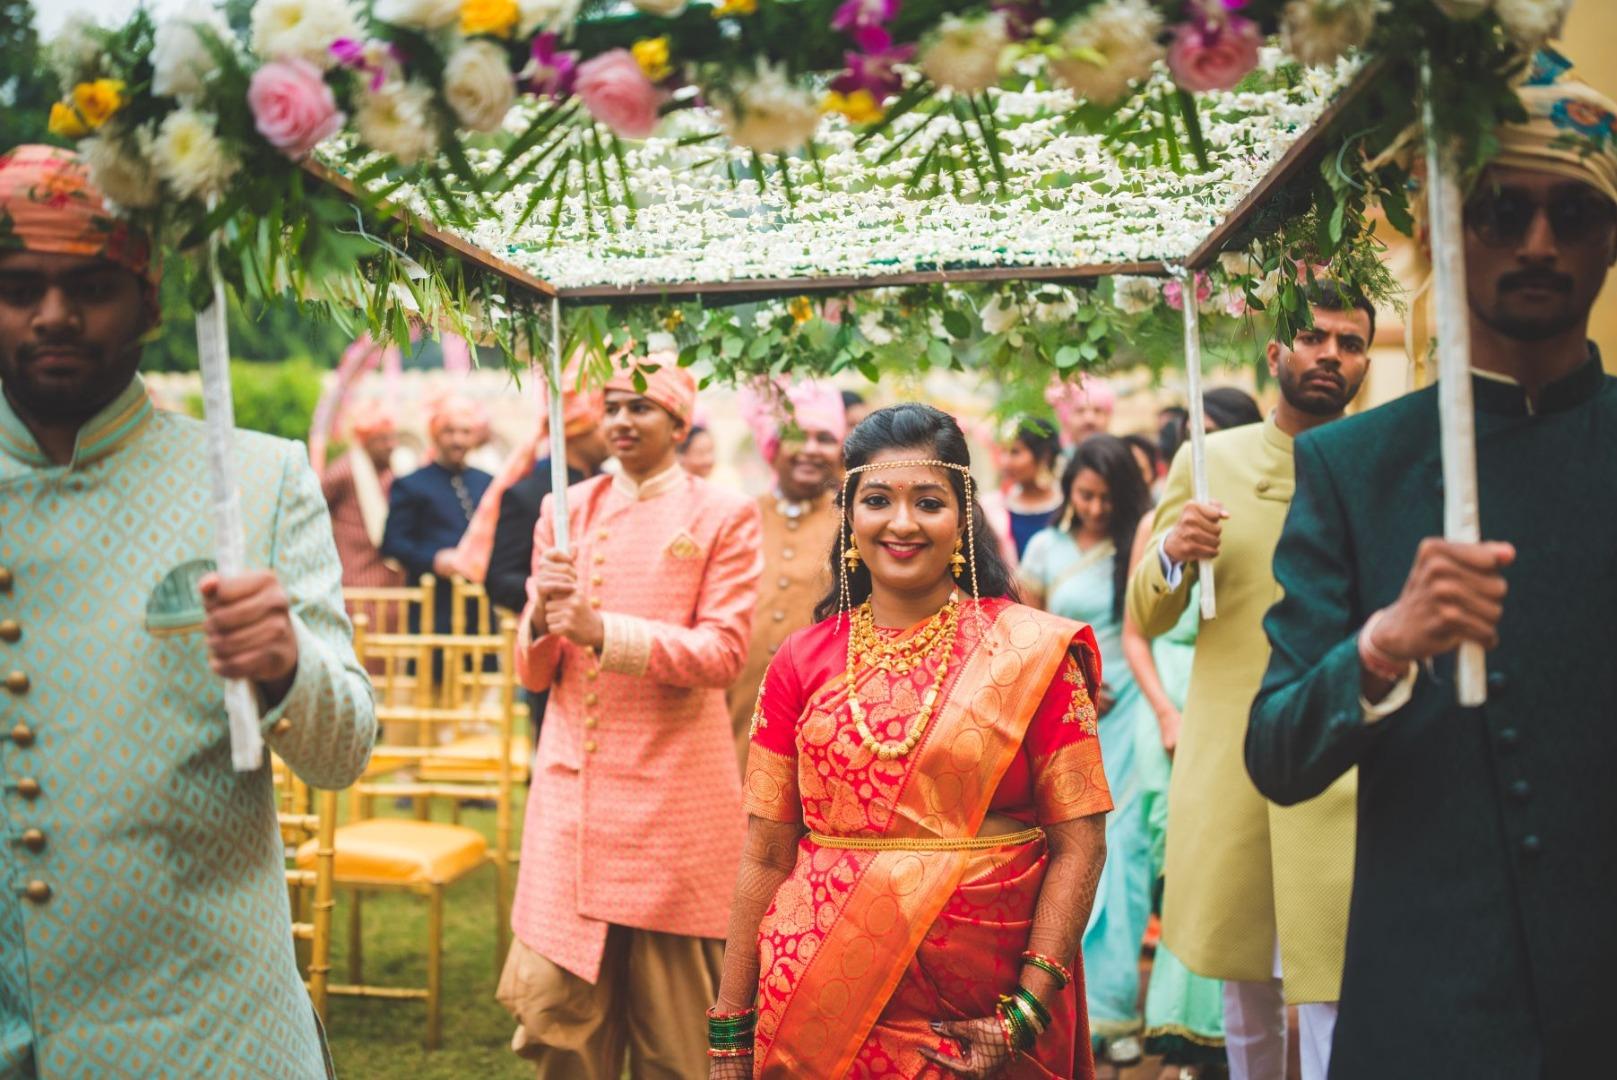 Maharashtrian Bride Entering in Phoolon Ki Chaadar